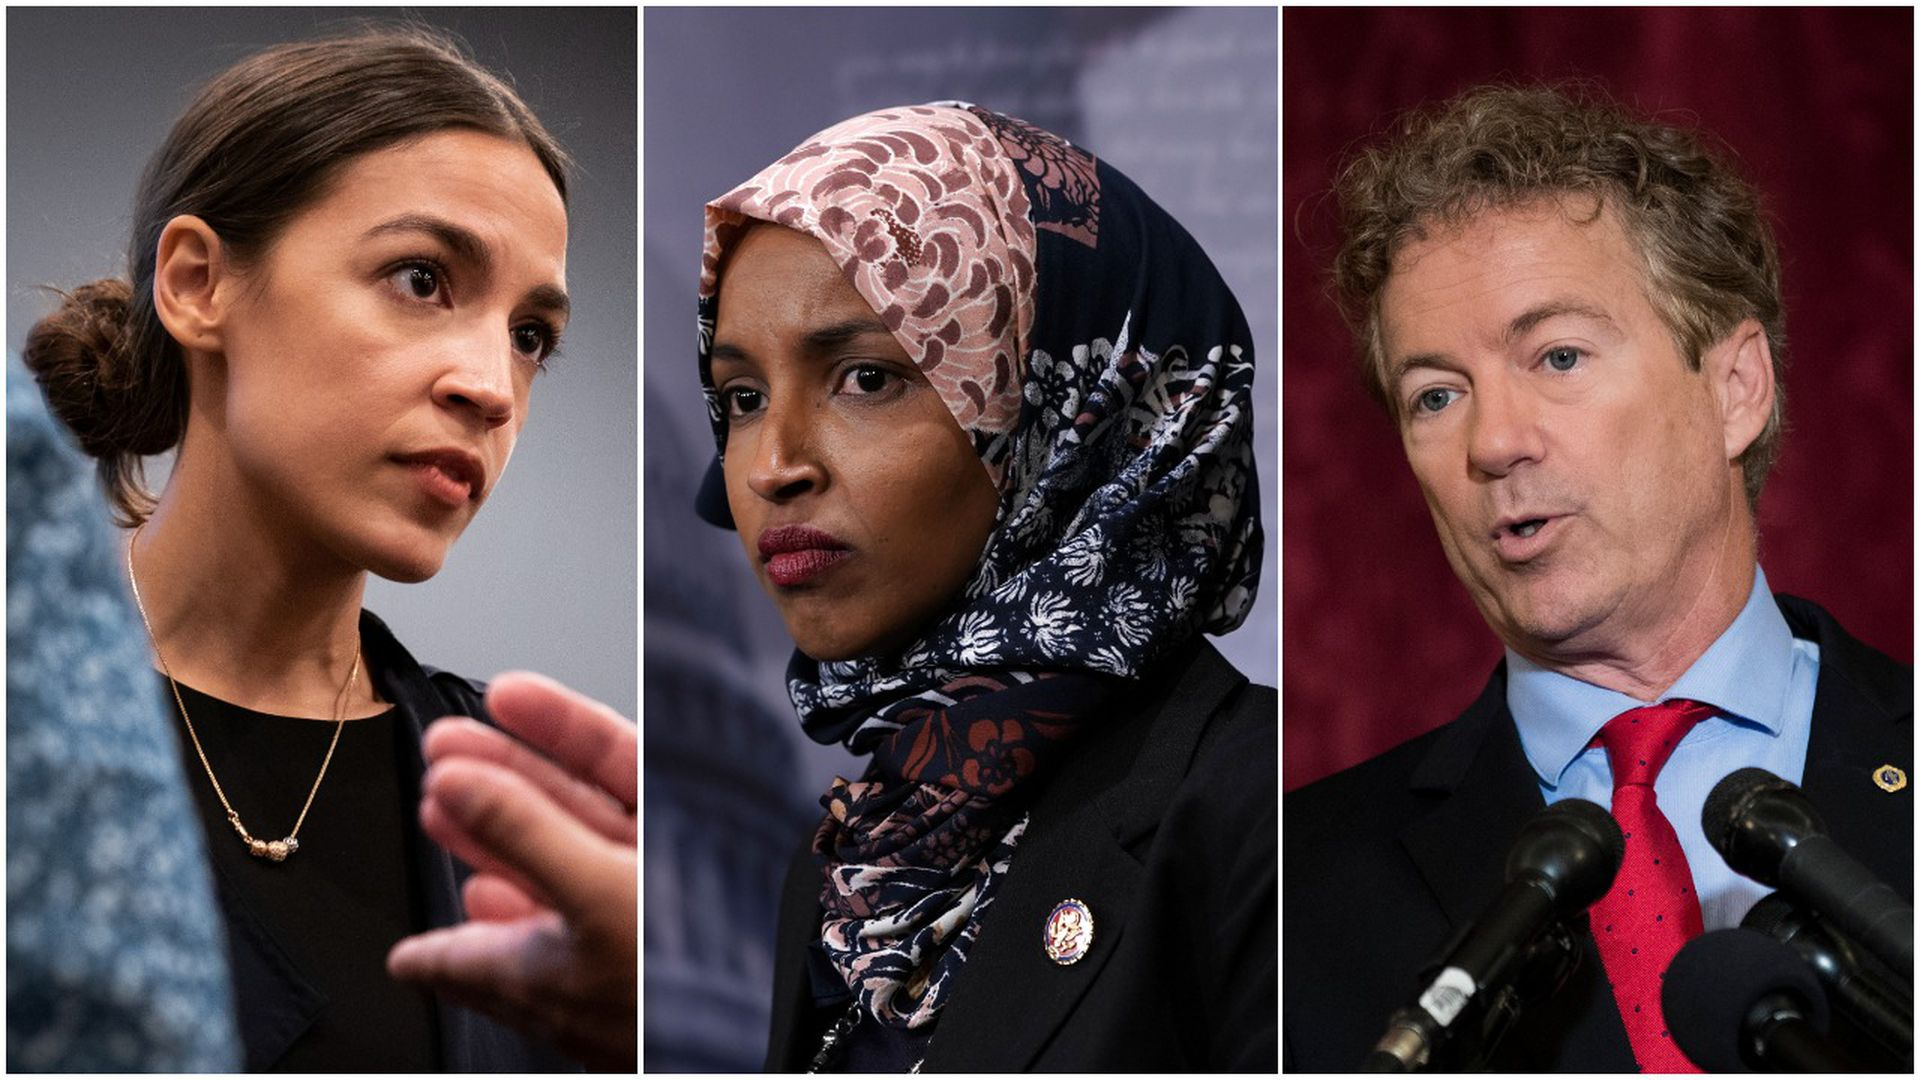 Reps. Alexandria Ocasio-Cortez, Ilhan Omar and Sen. Rand Paul